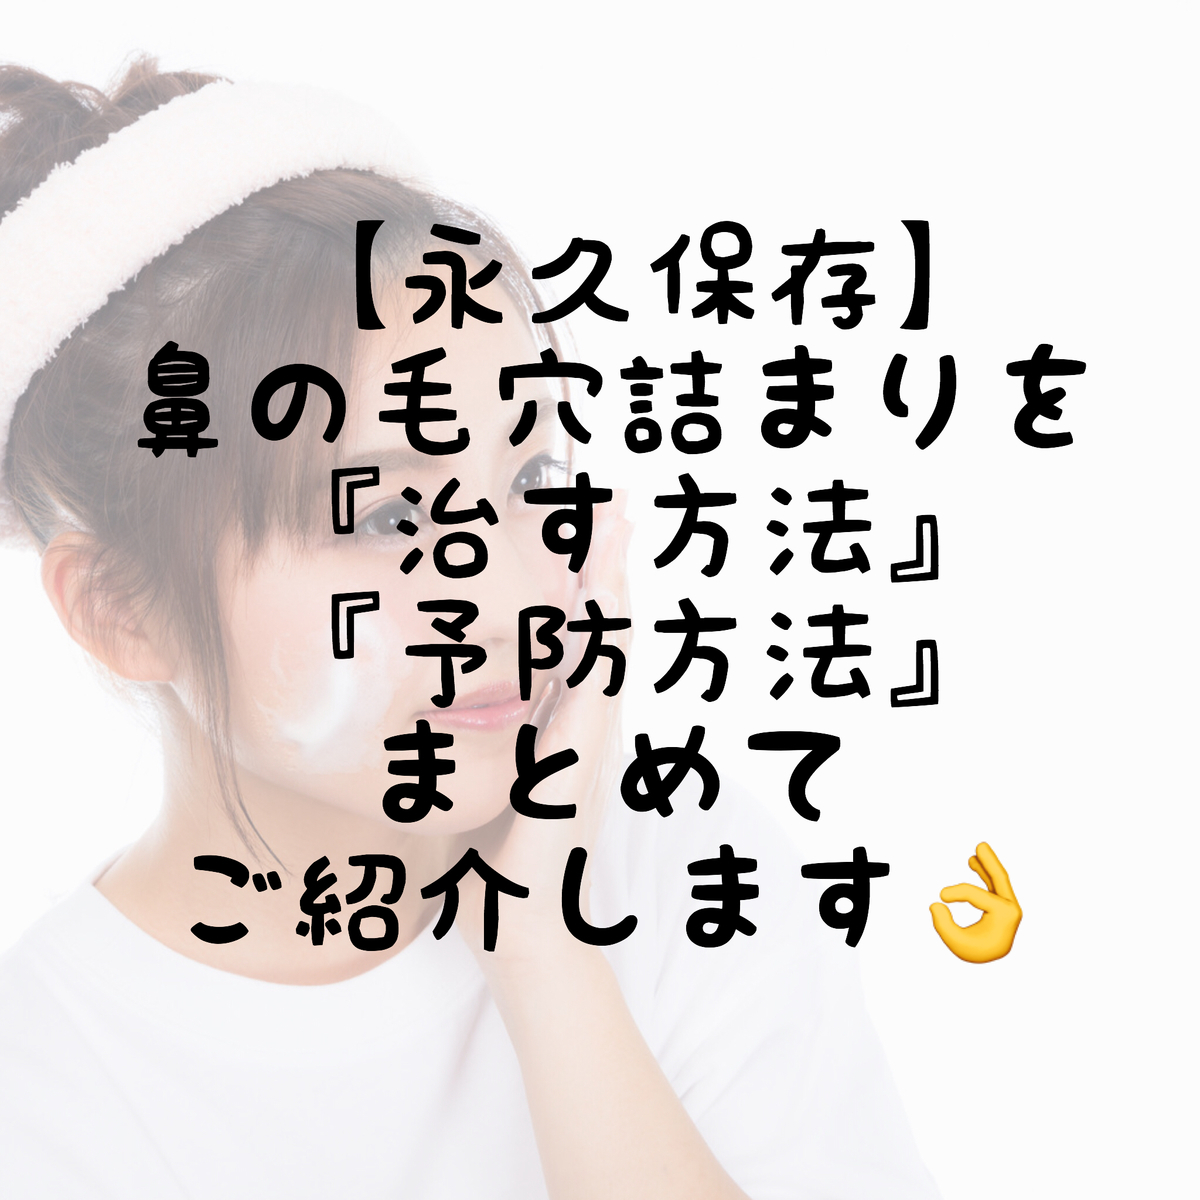 f:id:nokonoko_o:20200722183225j:plain